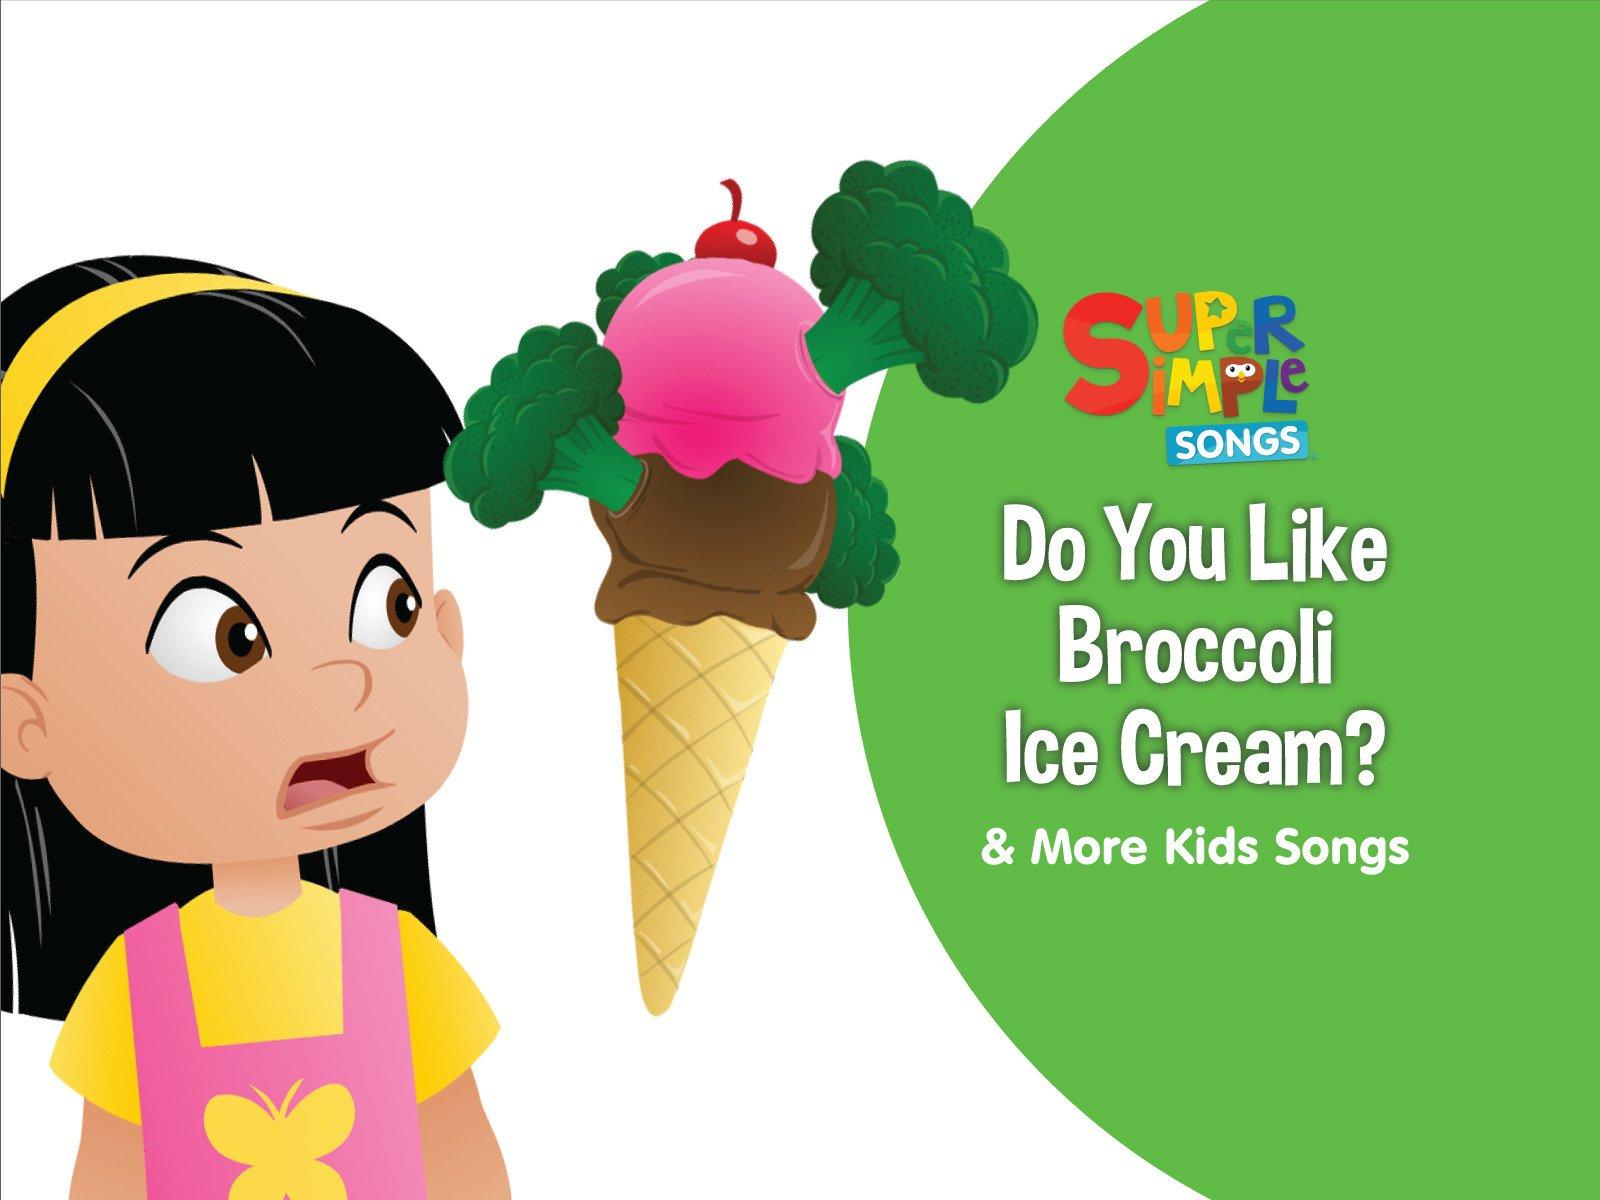 Do You Like Broccoli Ice Cream? & More Kids Songs - Season 1